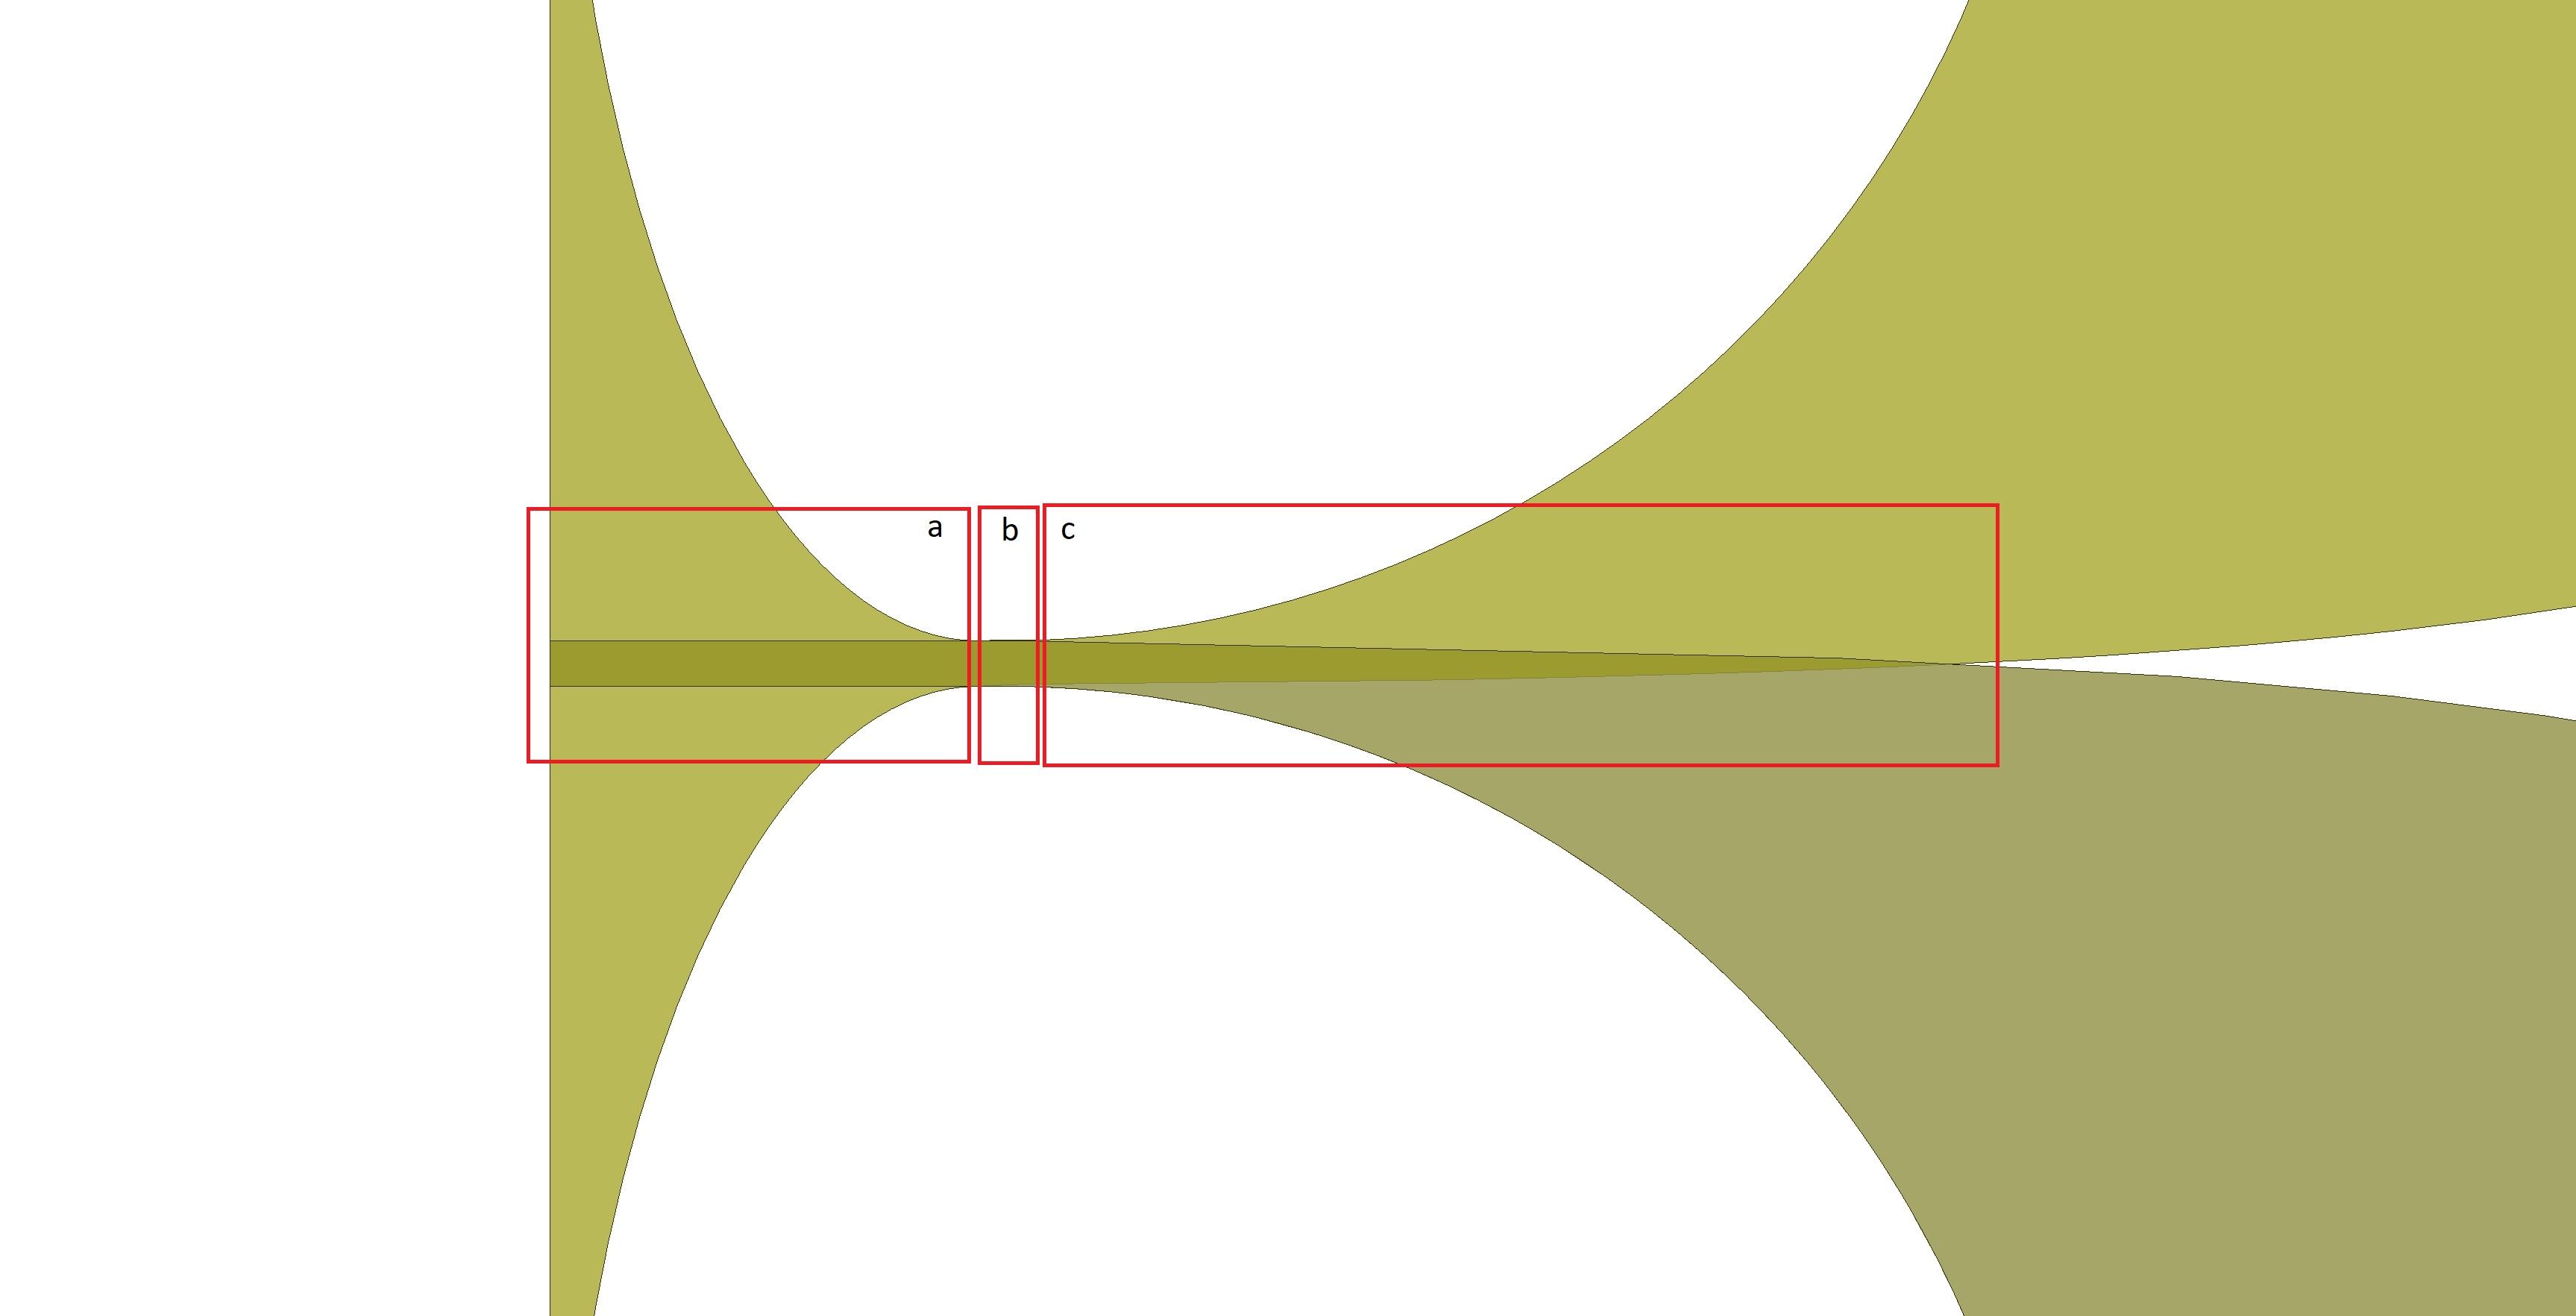 Making an Ultra-Wideband Antenna – Part 2 (Introducing the